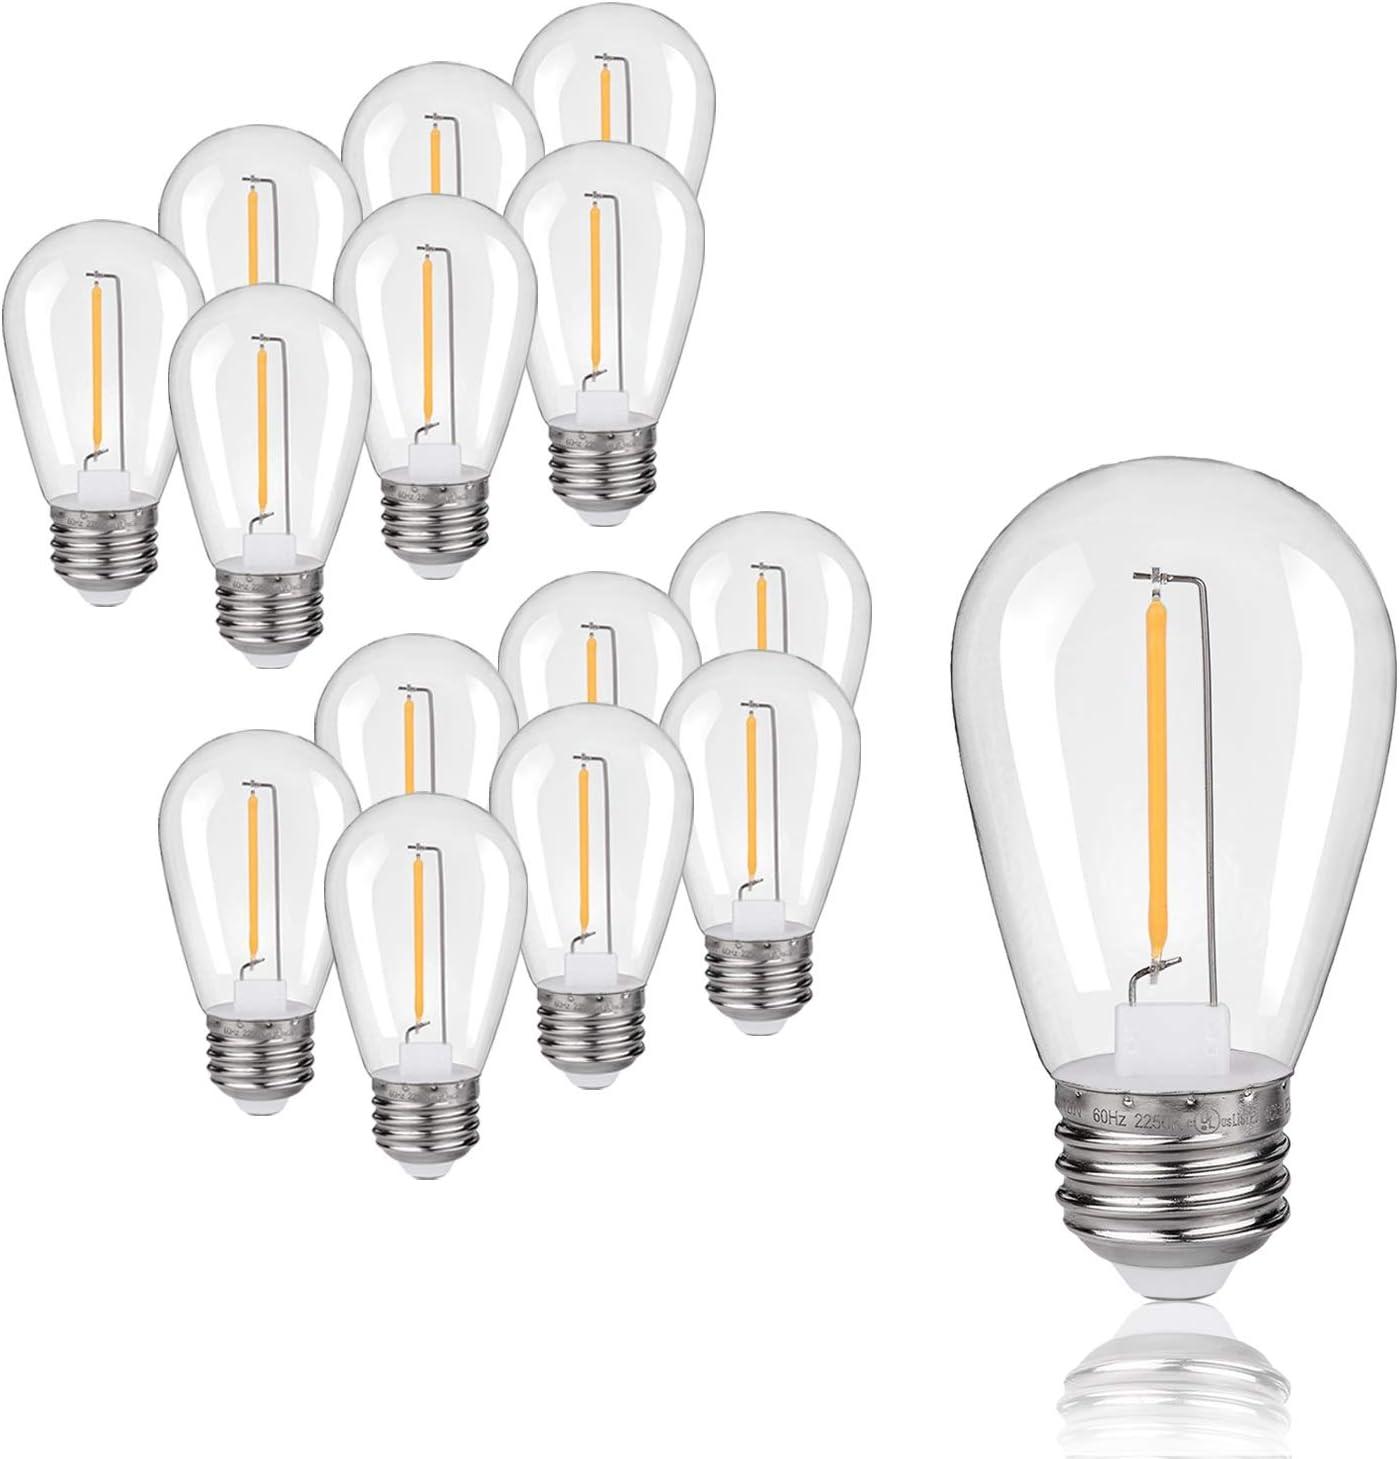 EMITTING Shatterproof /& Waterproof S14 Replacement LED Filament Light Bulbs